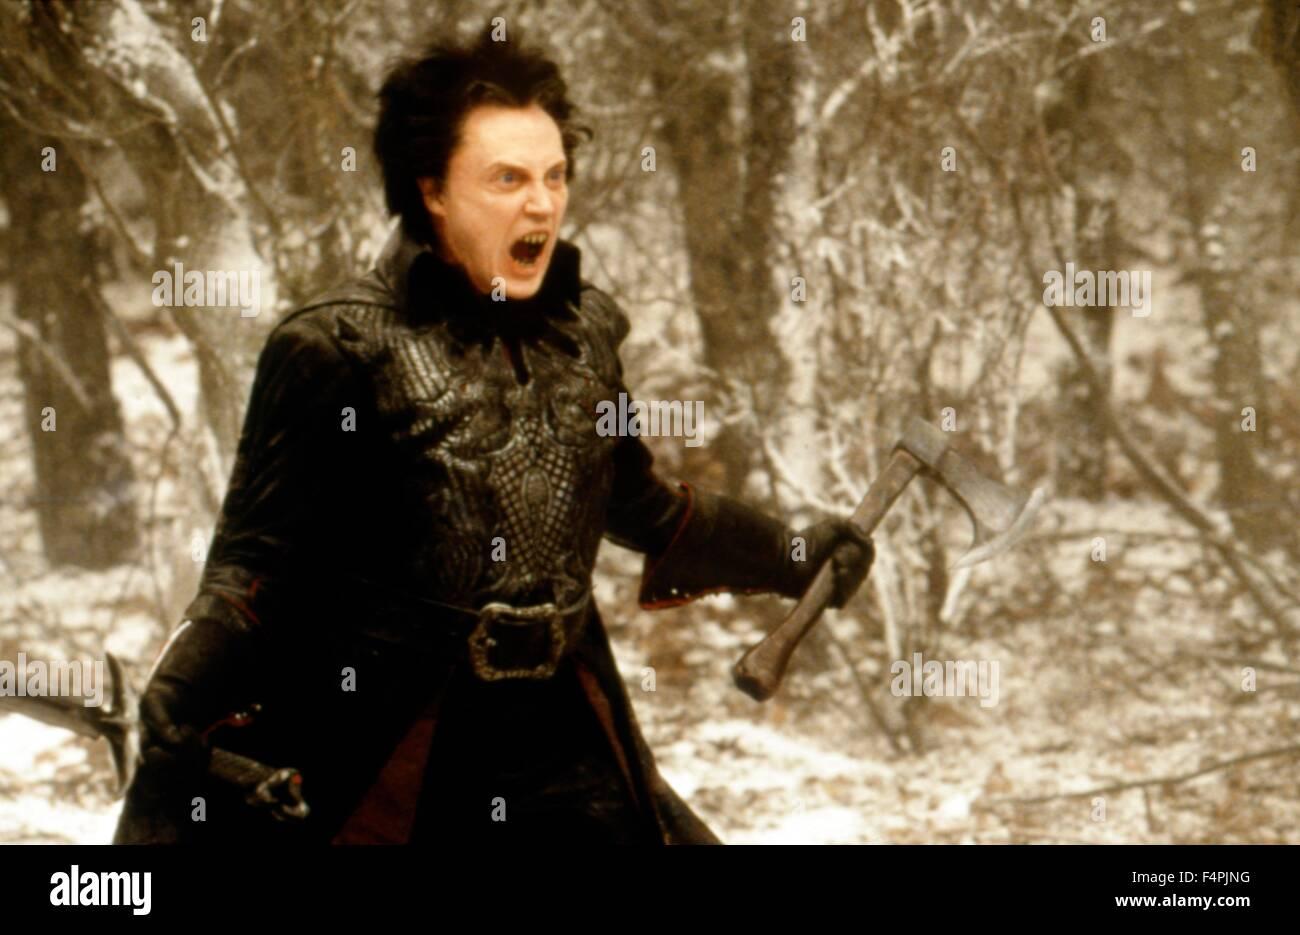 Christopher Walken / Sleepy Hollow / 1999 directed by Tim Burton [Paramount Pictures] - Stock Image